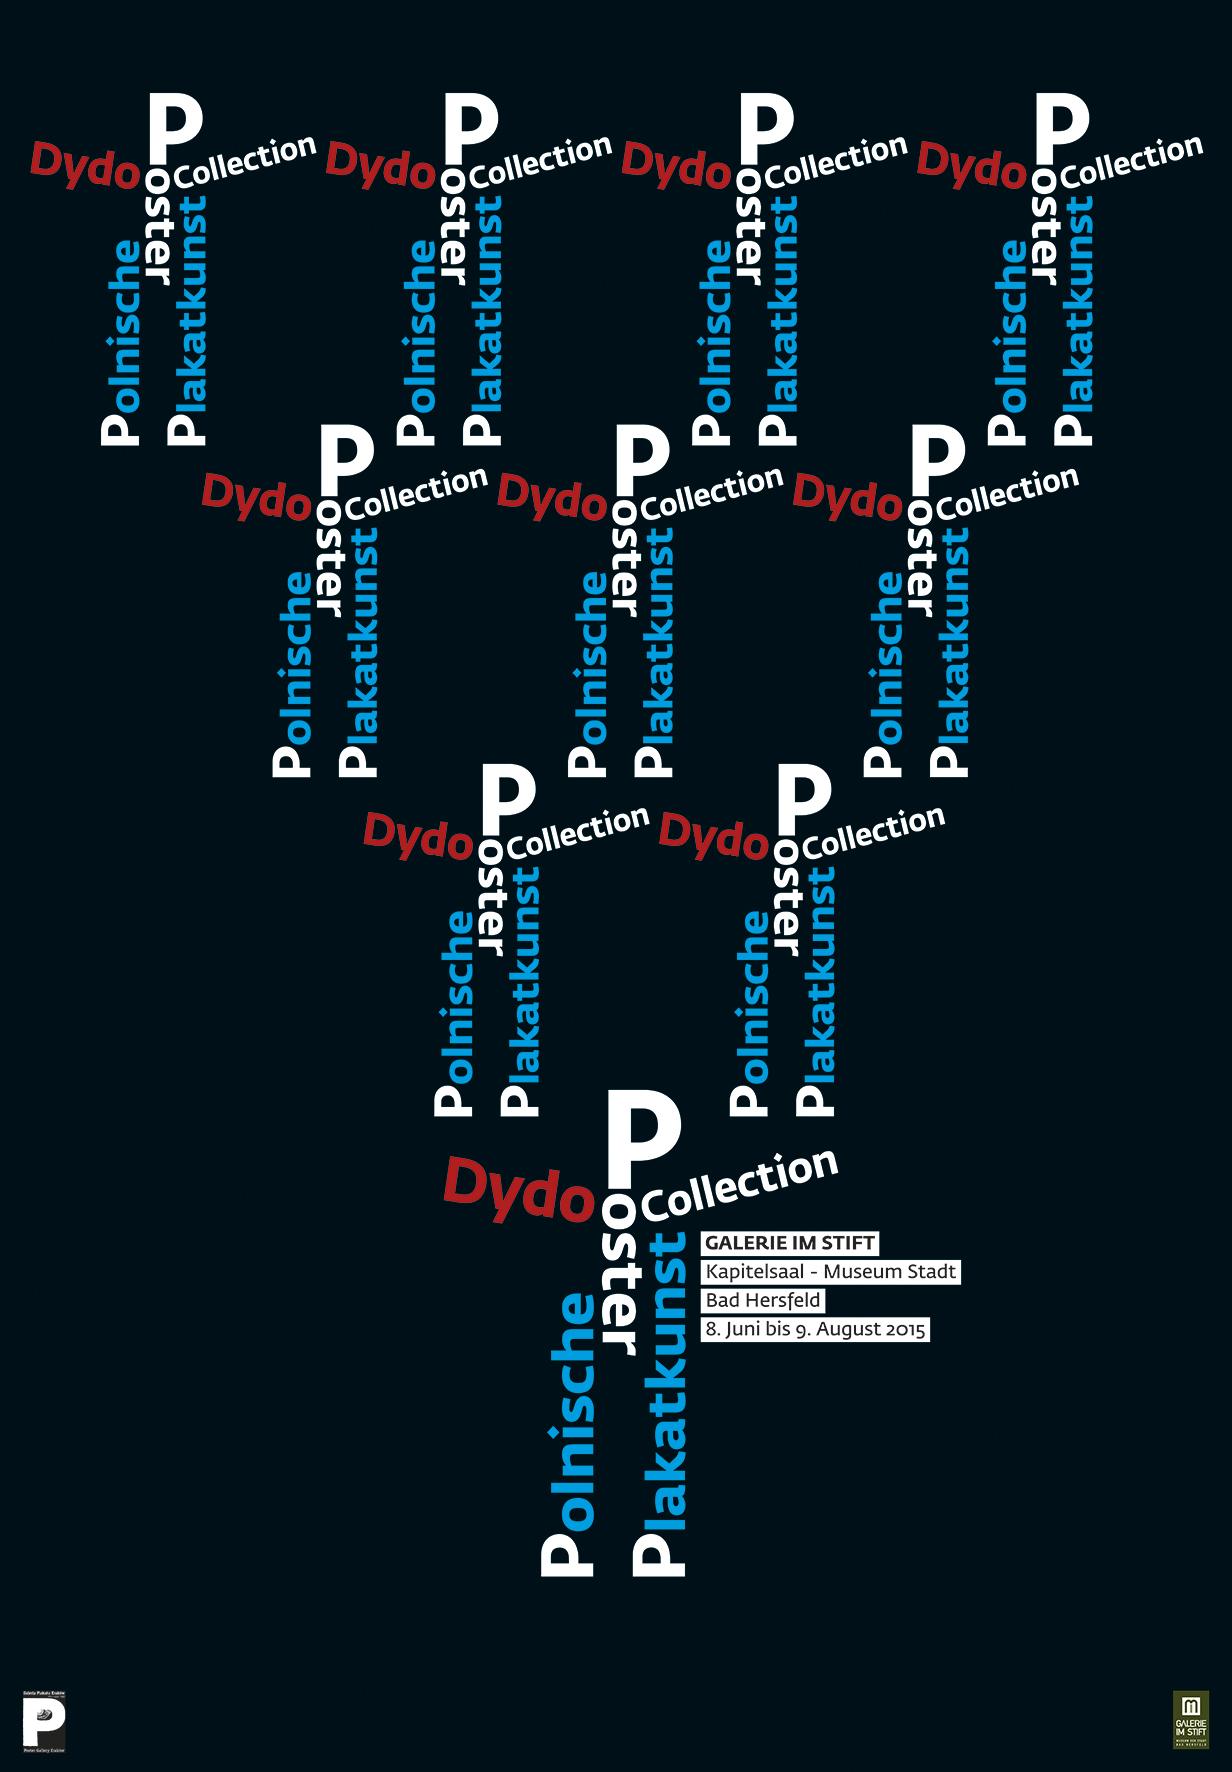 Dydo Poster Collektion, 2015